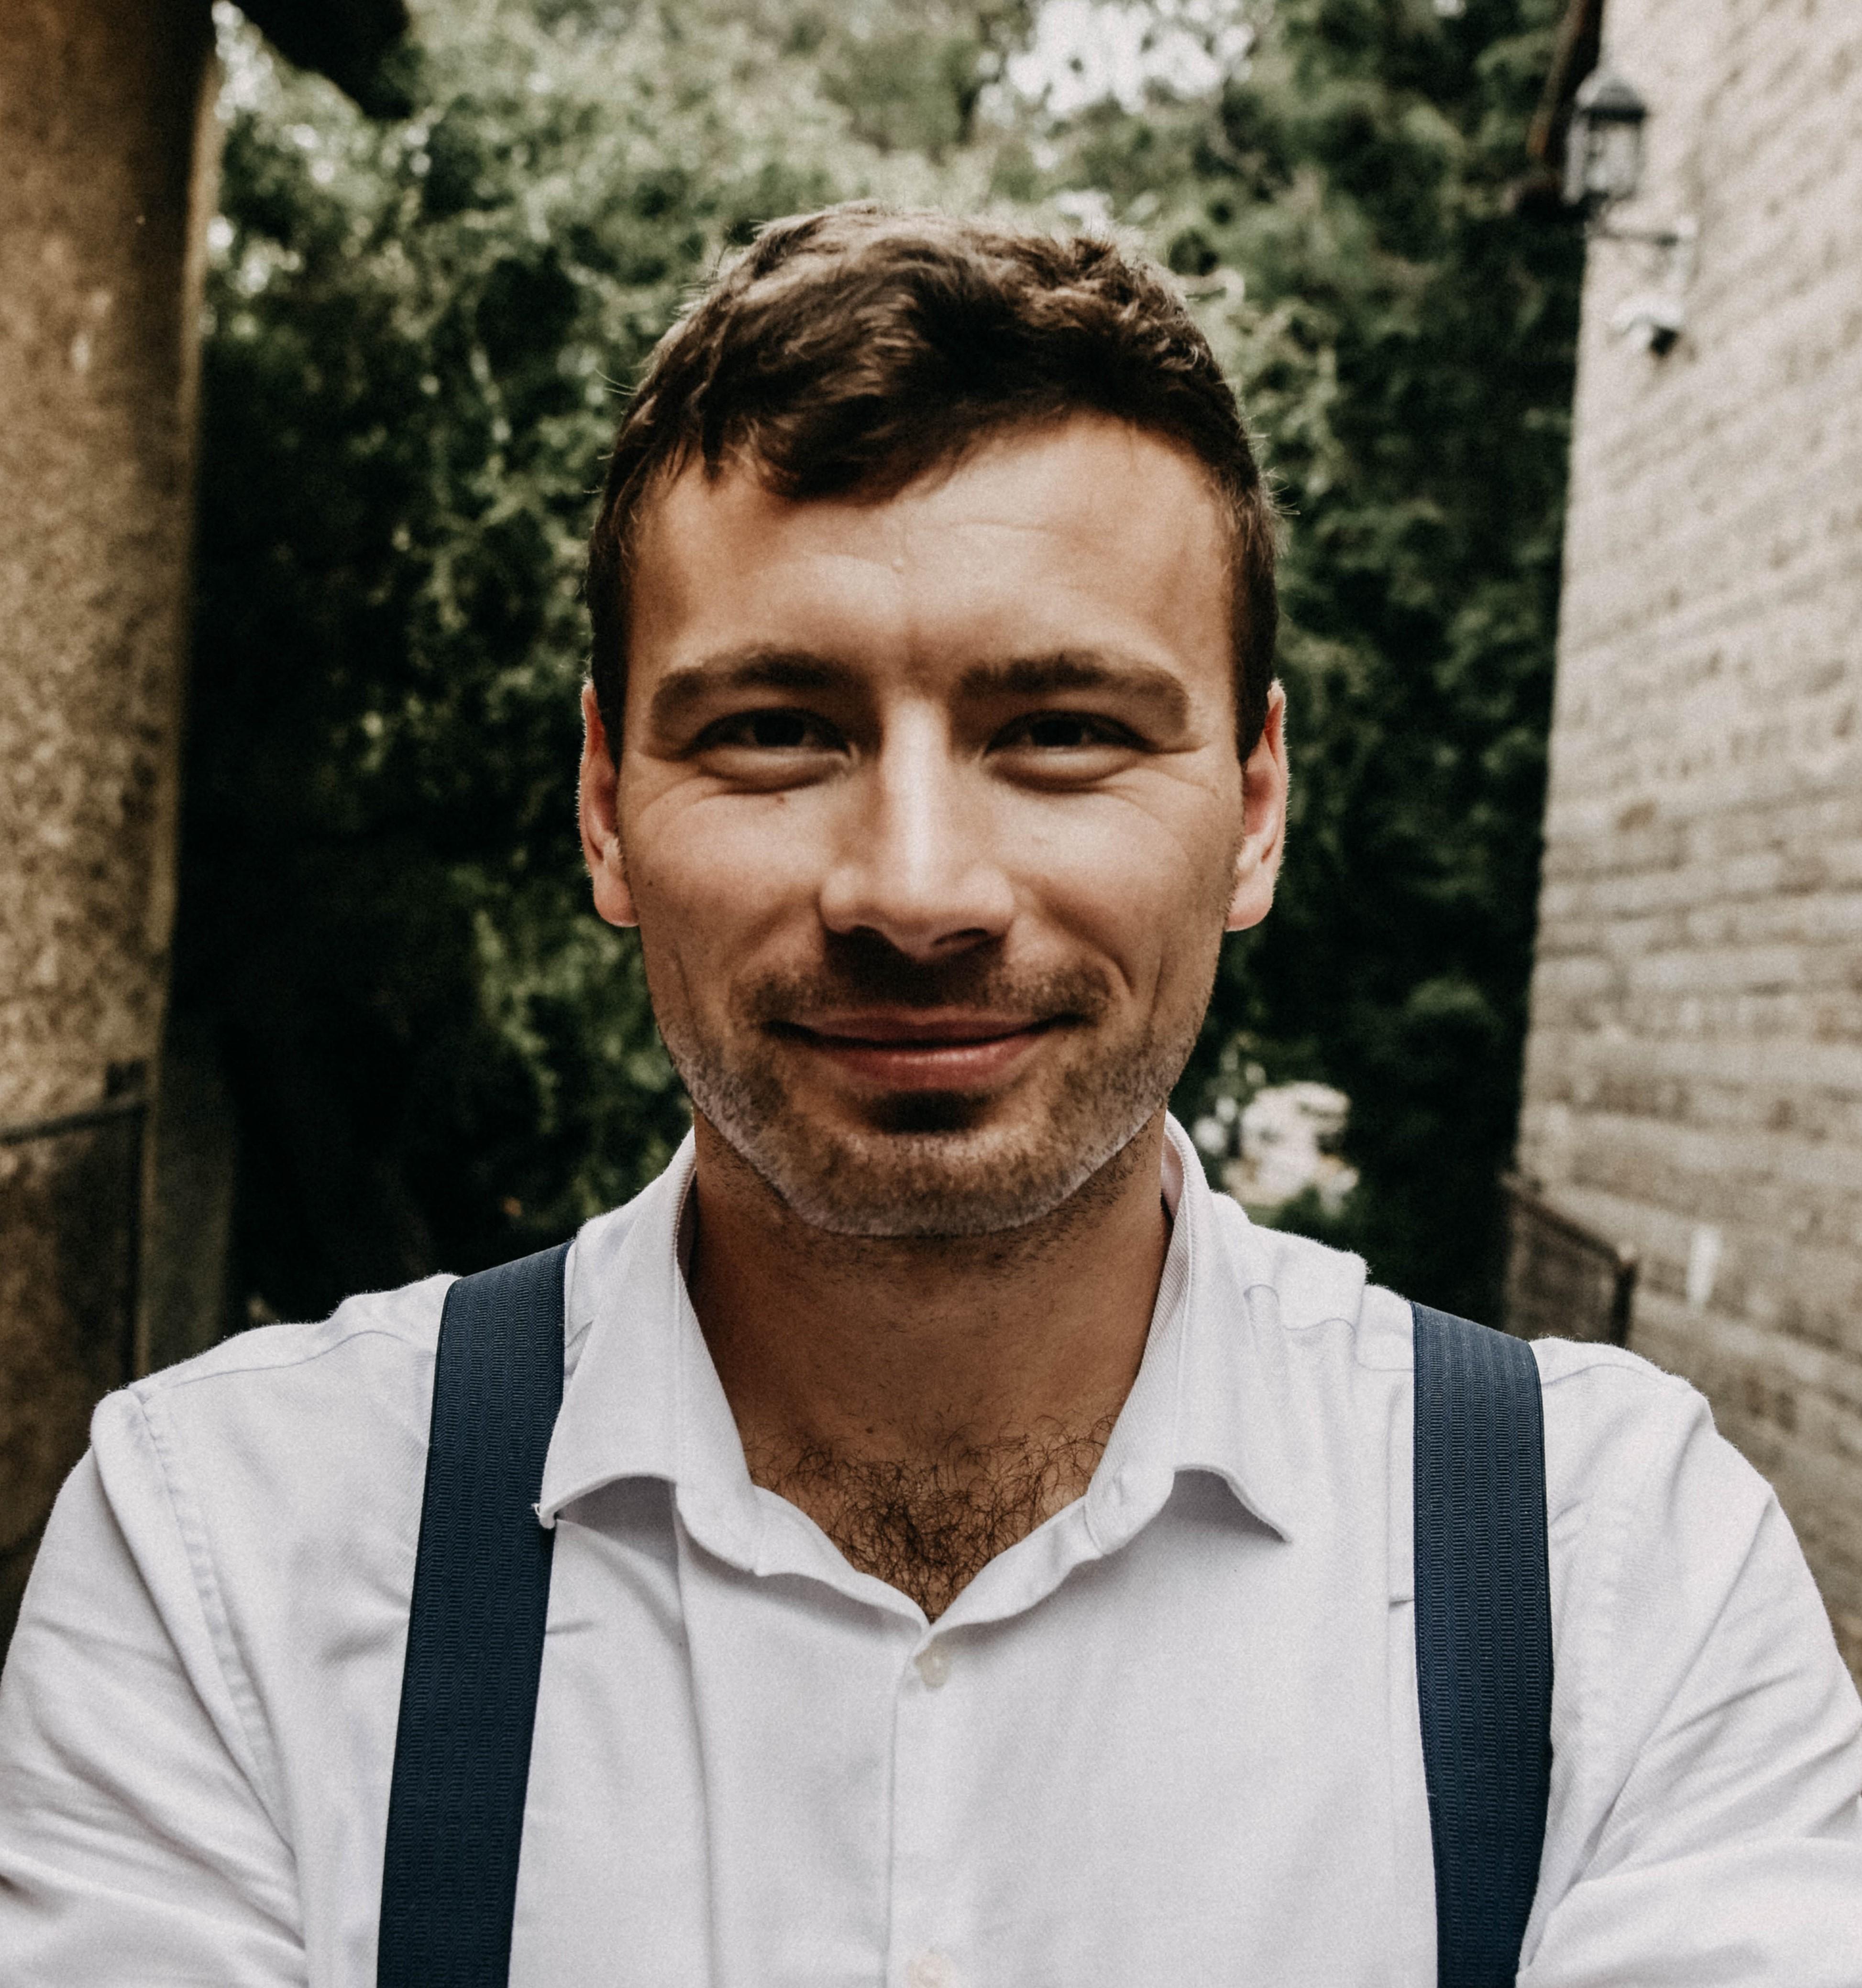 Petr Freimann